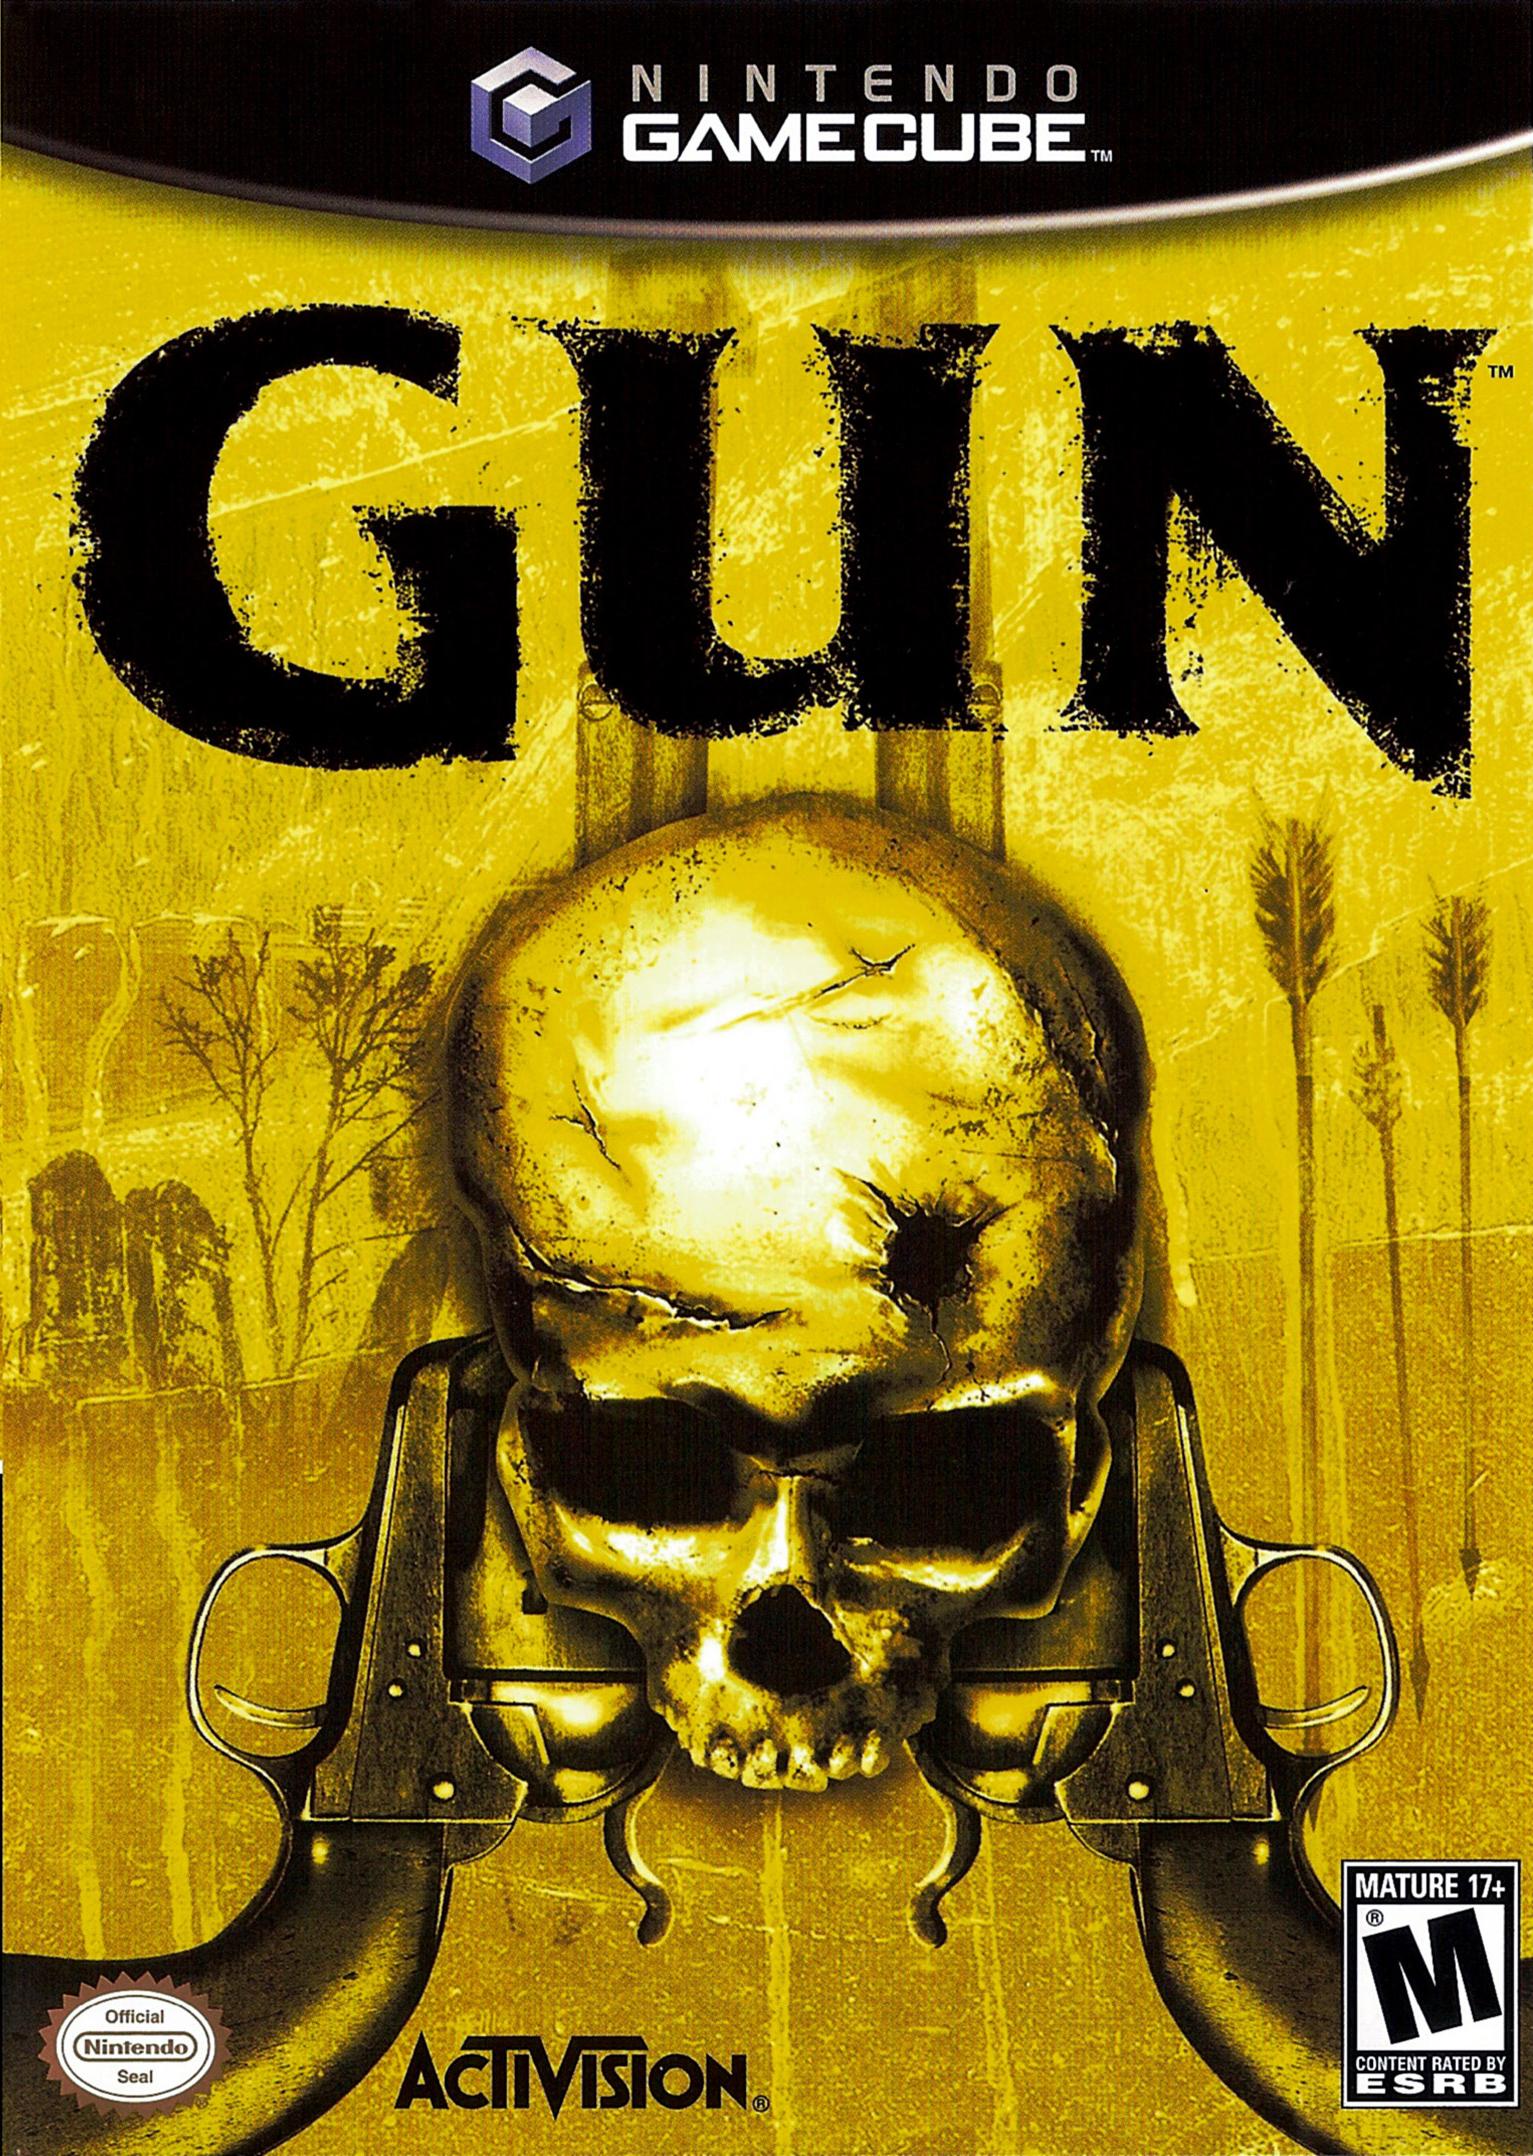 Gun/Game Cube